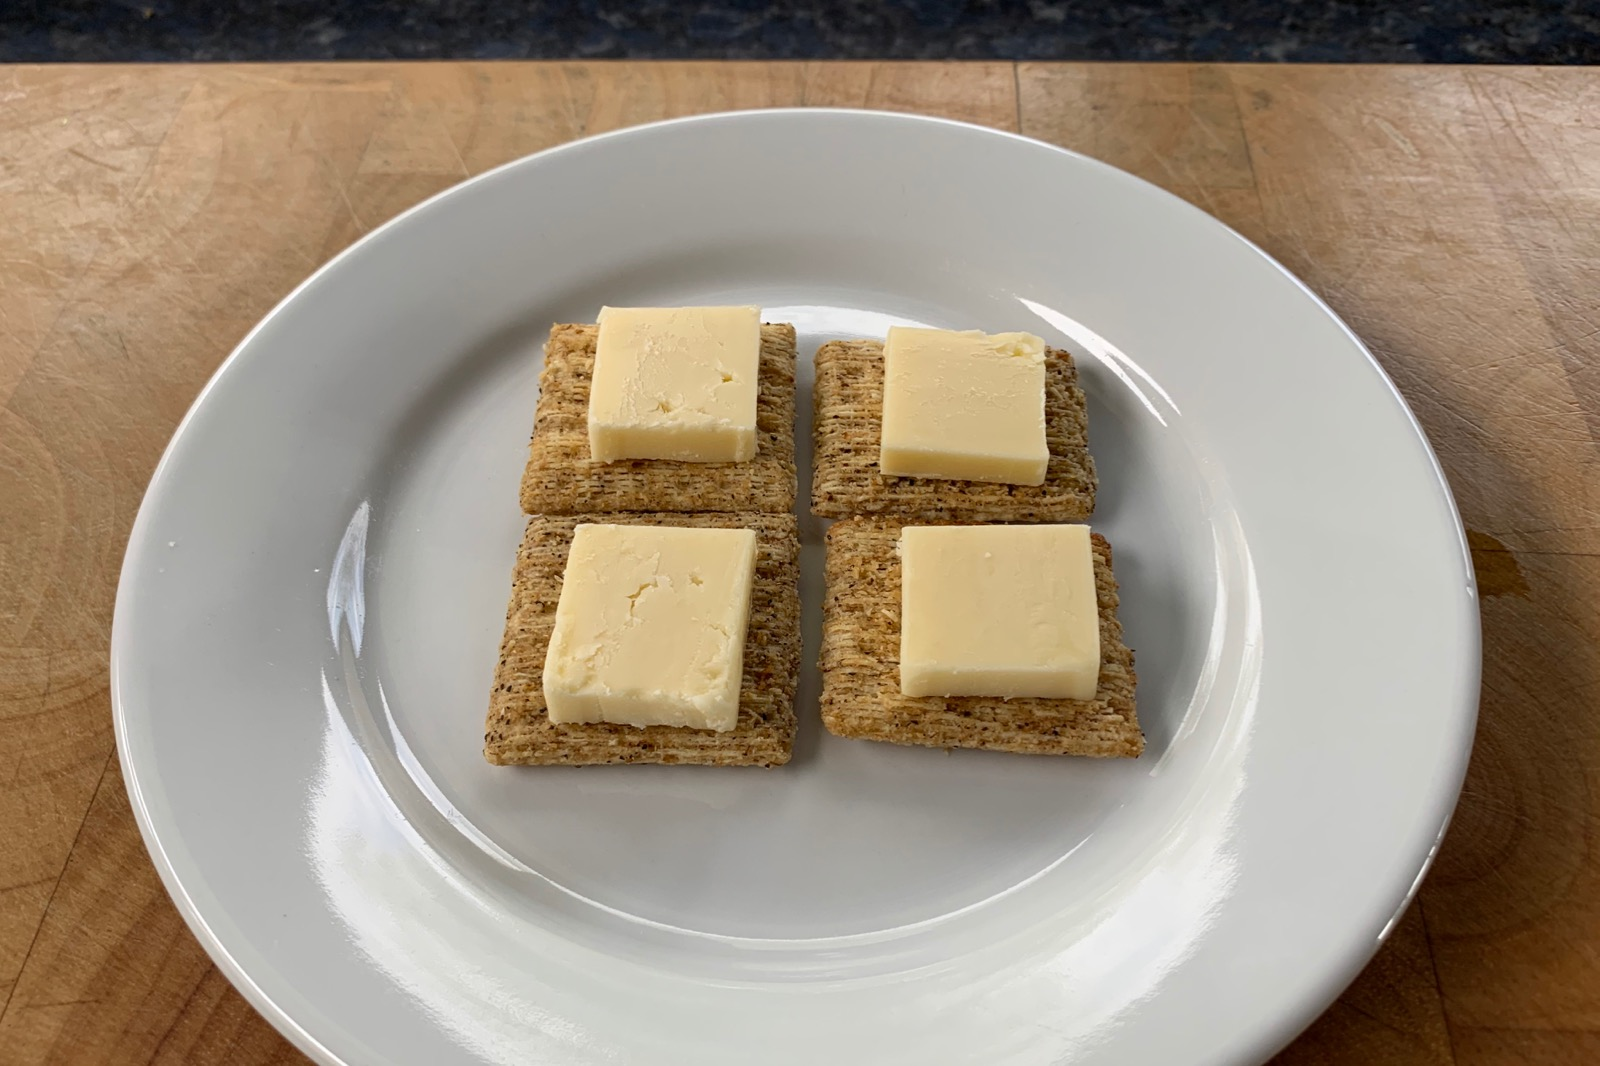 http://blog.rickk.com/food/2020/10/04/ate.2020.10.04.s1.jpg